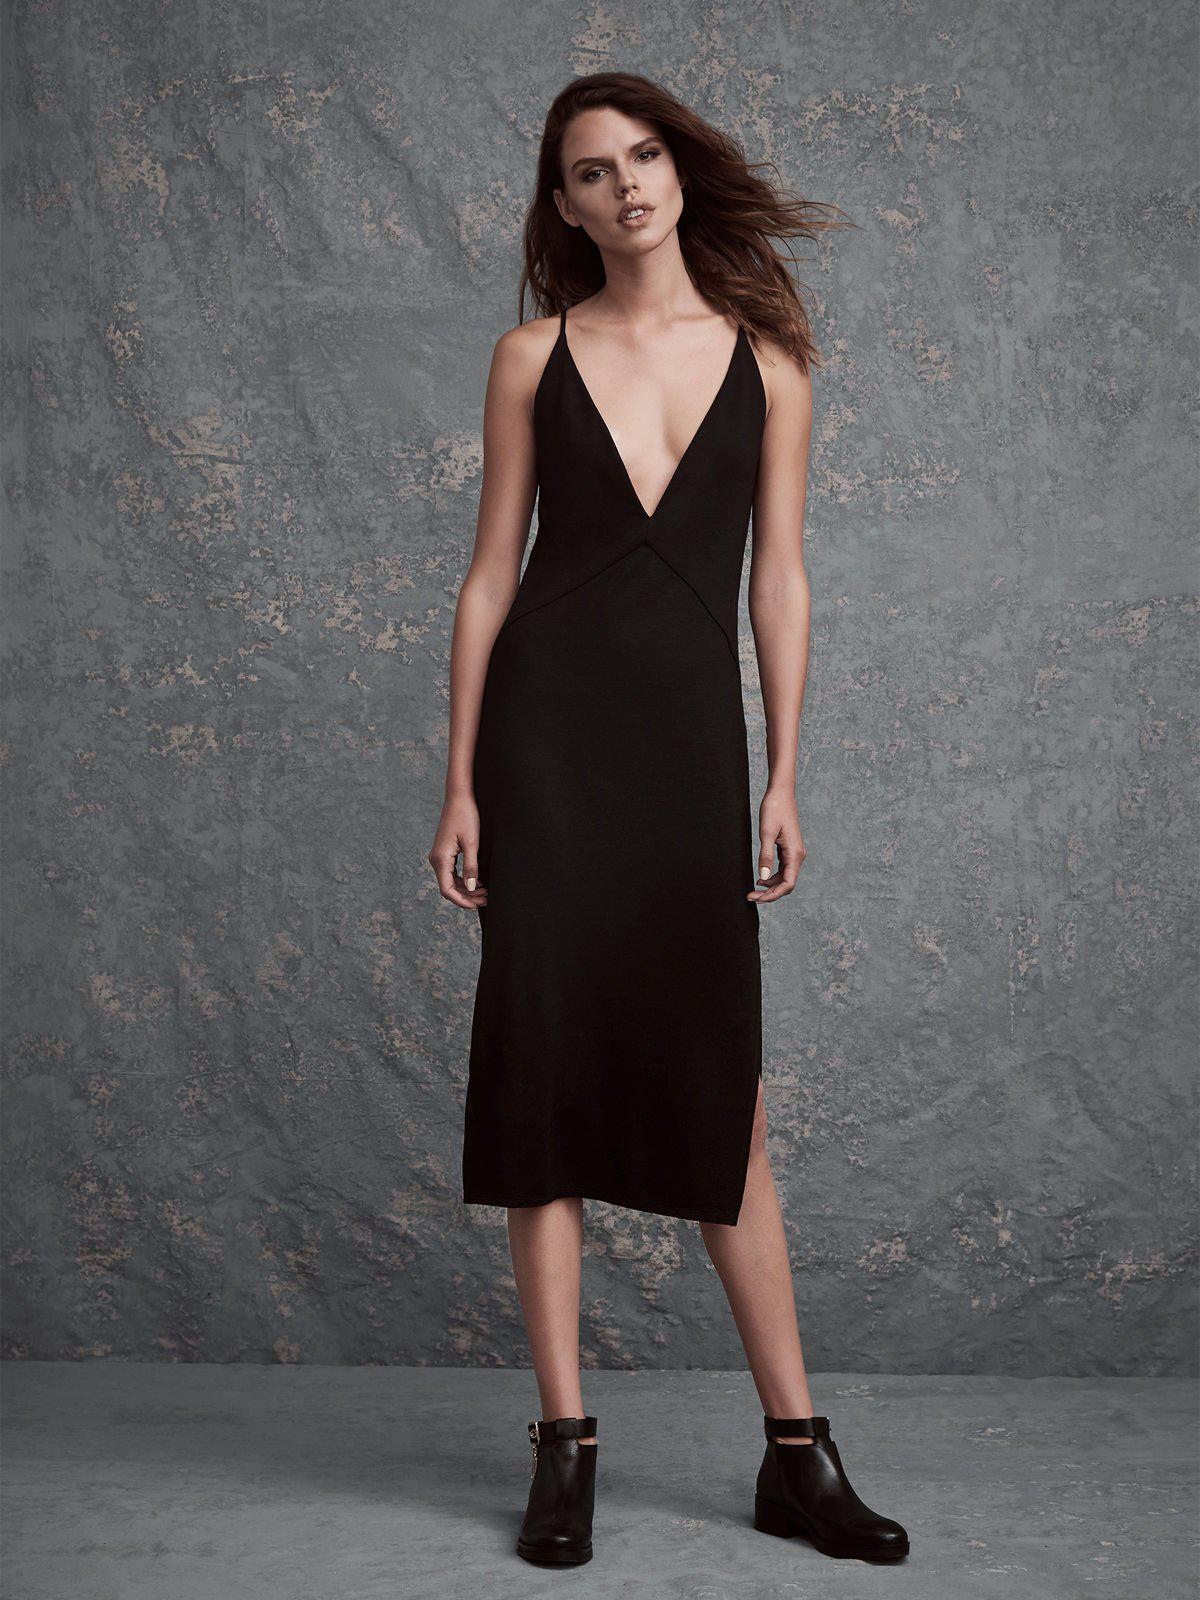 5673022da4d2d Lyst - Lanston Slit Cami Midi Dress in Black